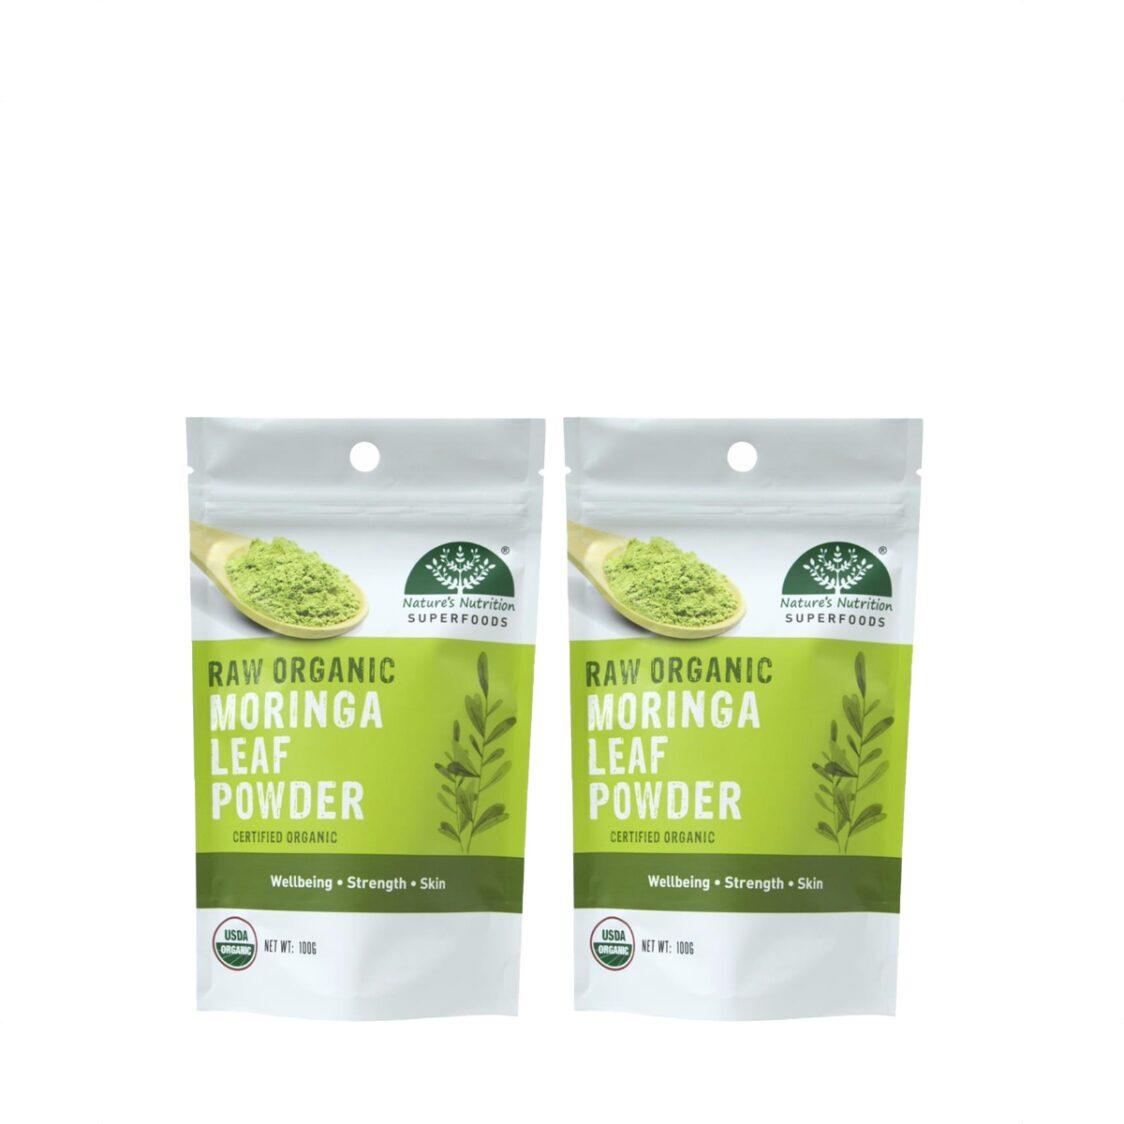 Natures Nutrition Organic Moringa Leaf Powder 100g Bundle of 2